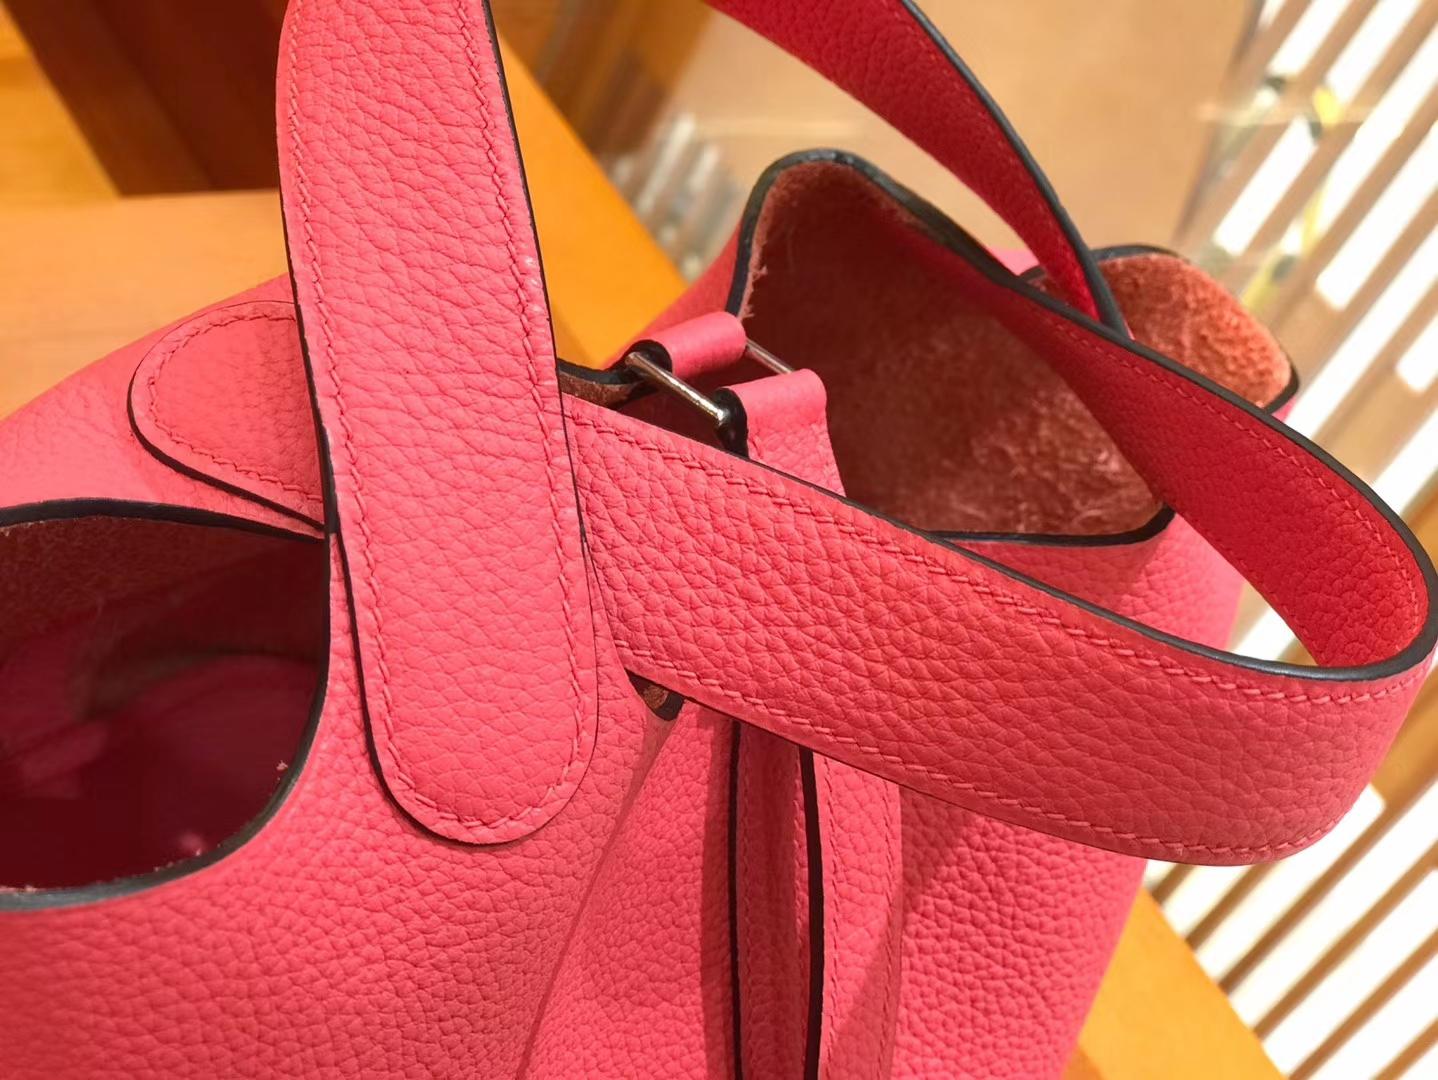 Hermès(爱马仕)Piction 18cm 唇膏粉 银扣 Togo小牛皮 全手工缝制